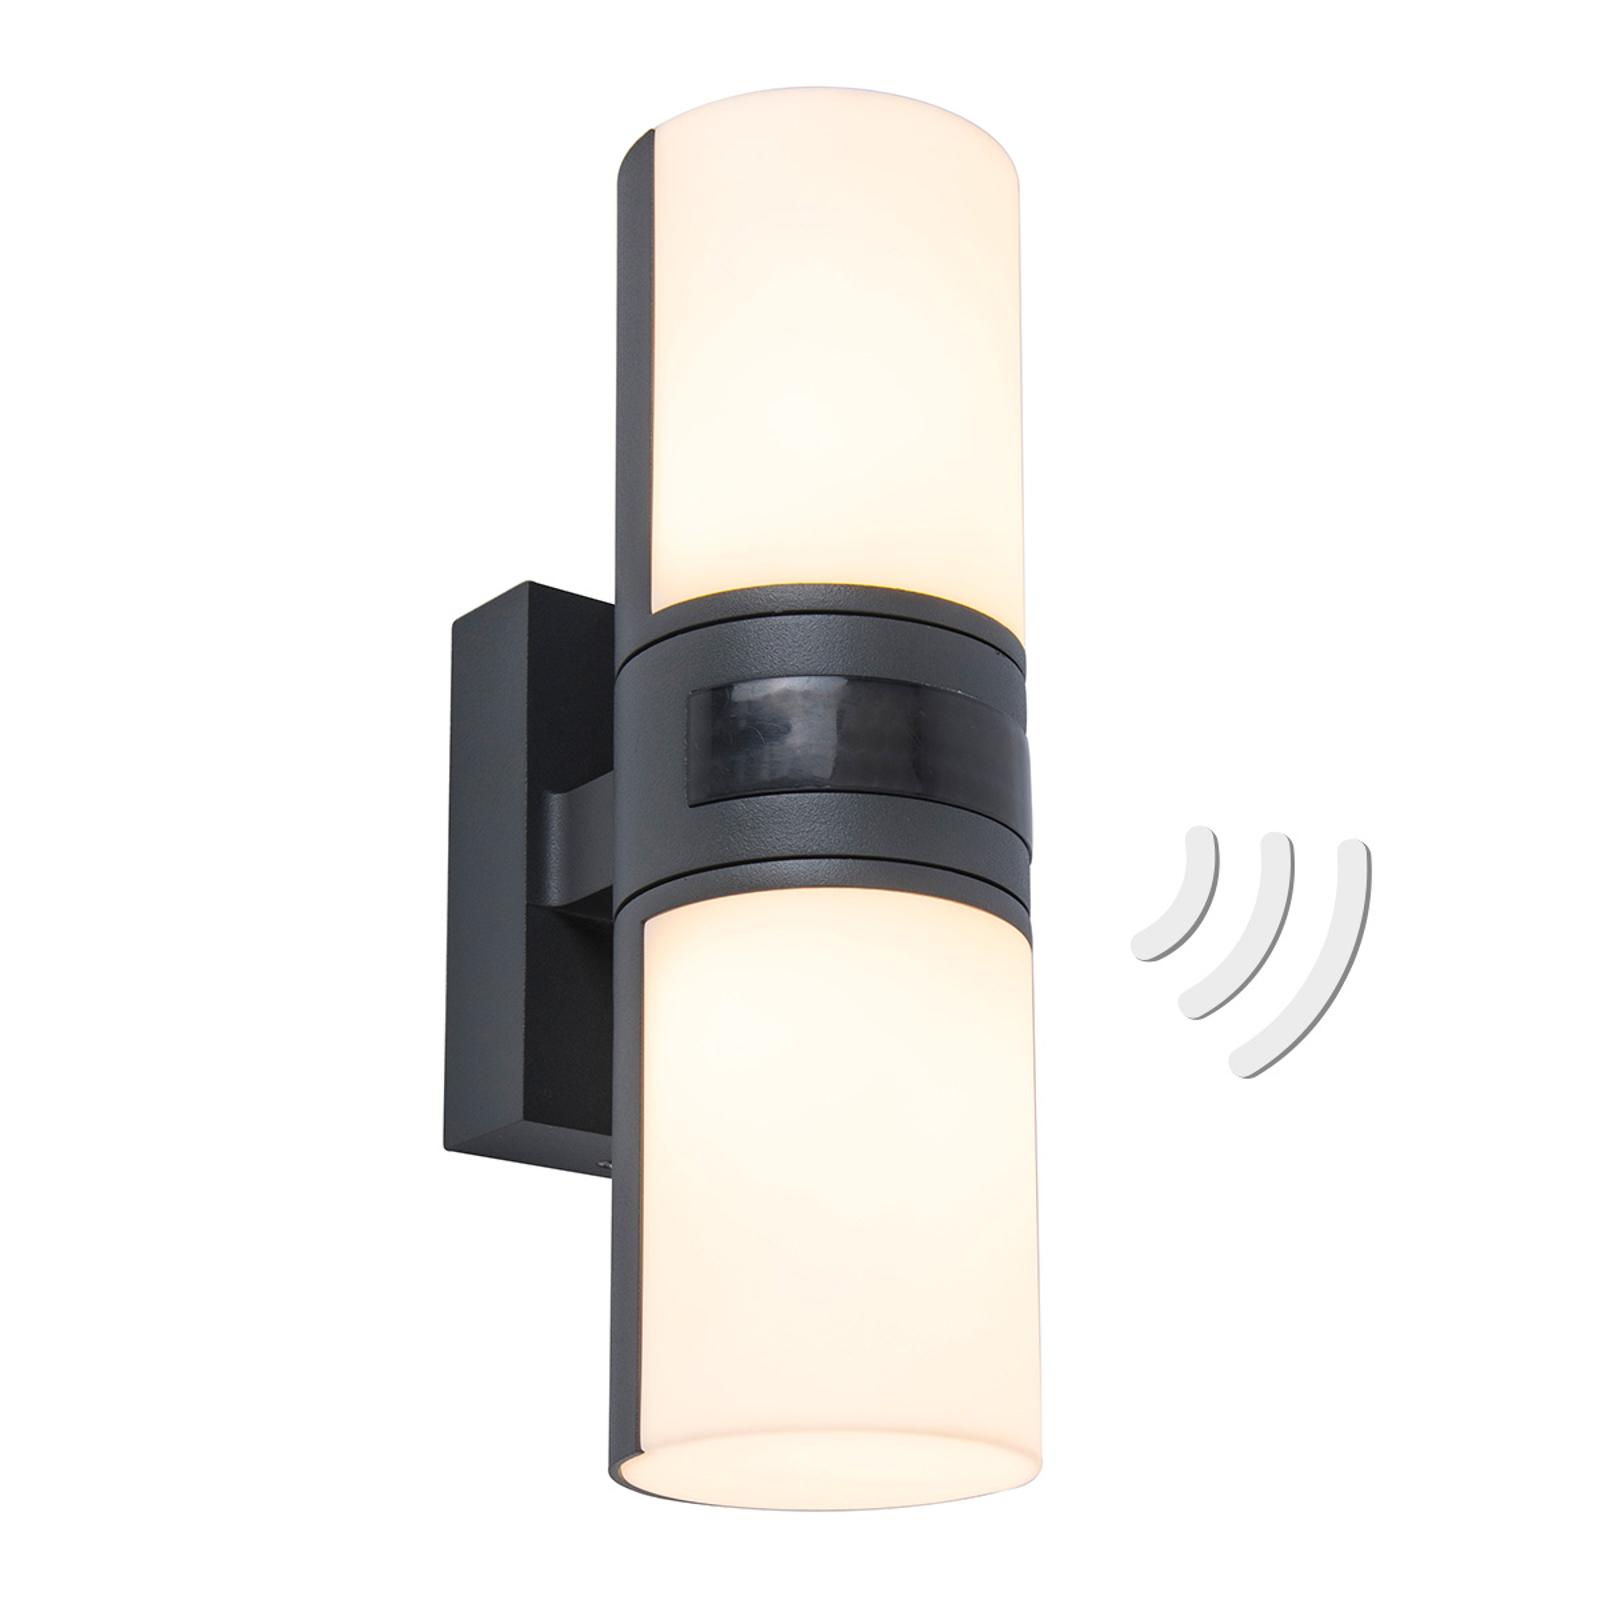 LED-Außenwandleuchte Cyra, zweiflammig, Sensor